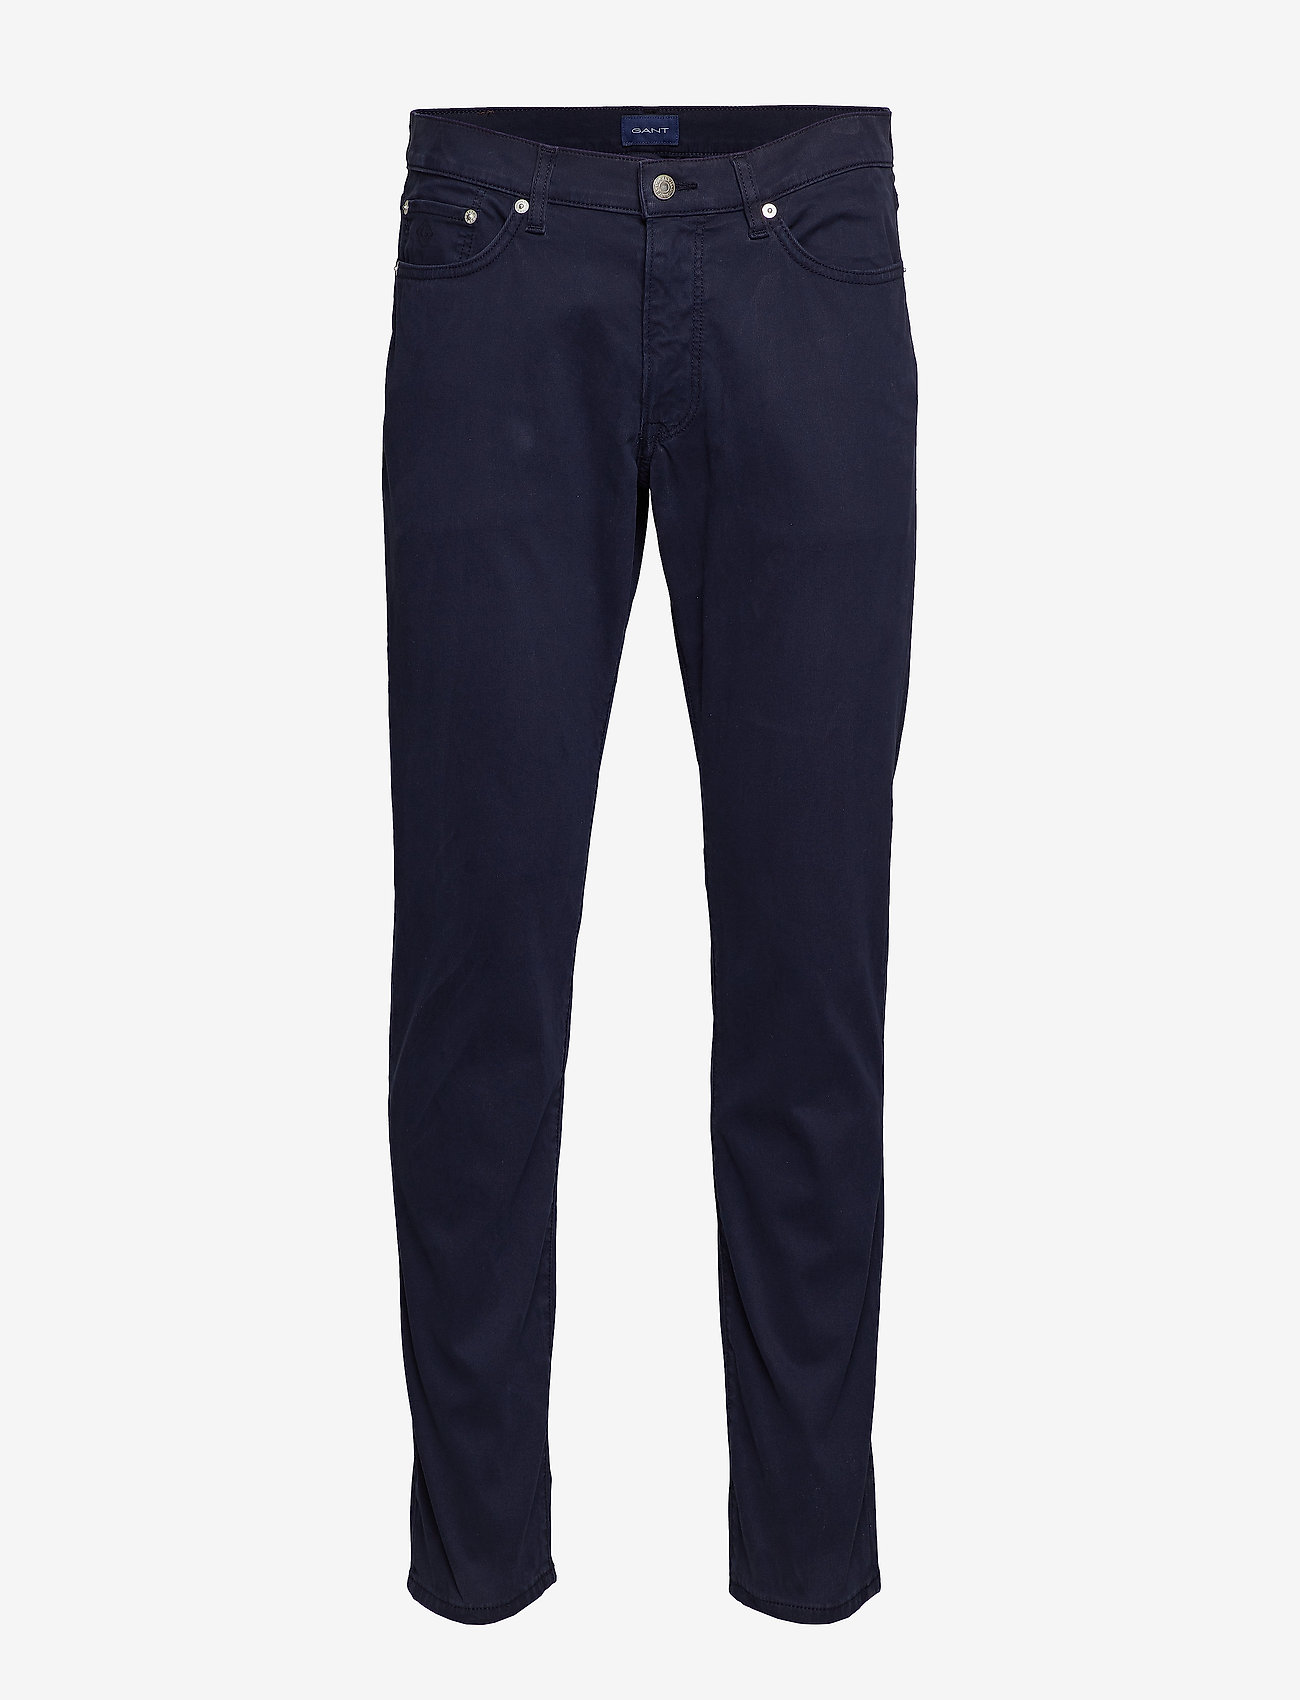 Gant - D1. SLIM BEDFORD JEANS - slim jeans - marine